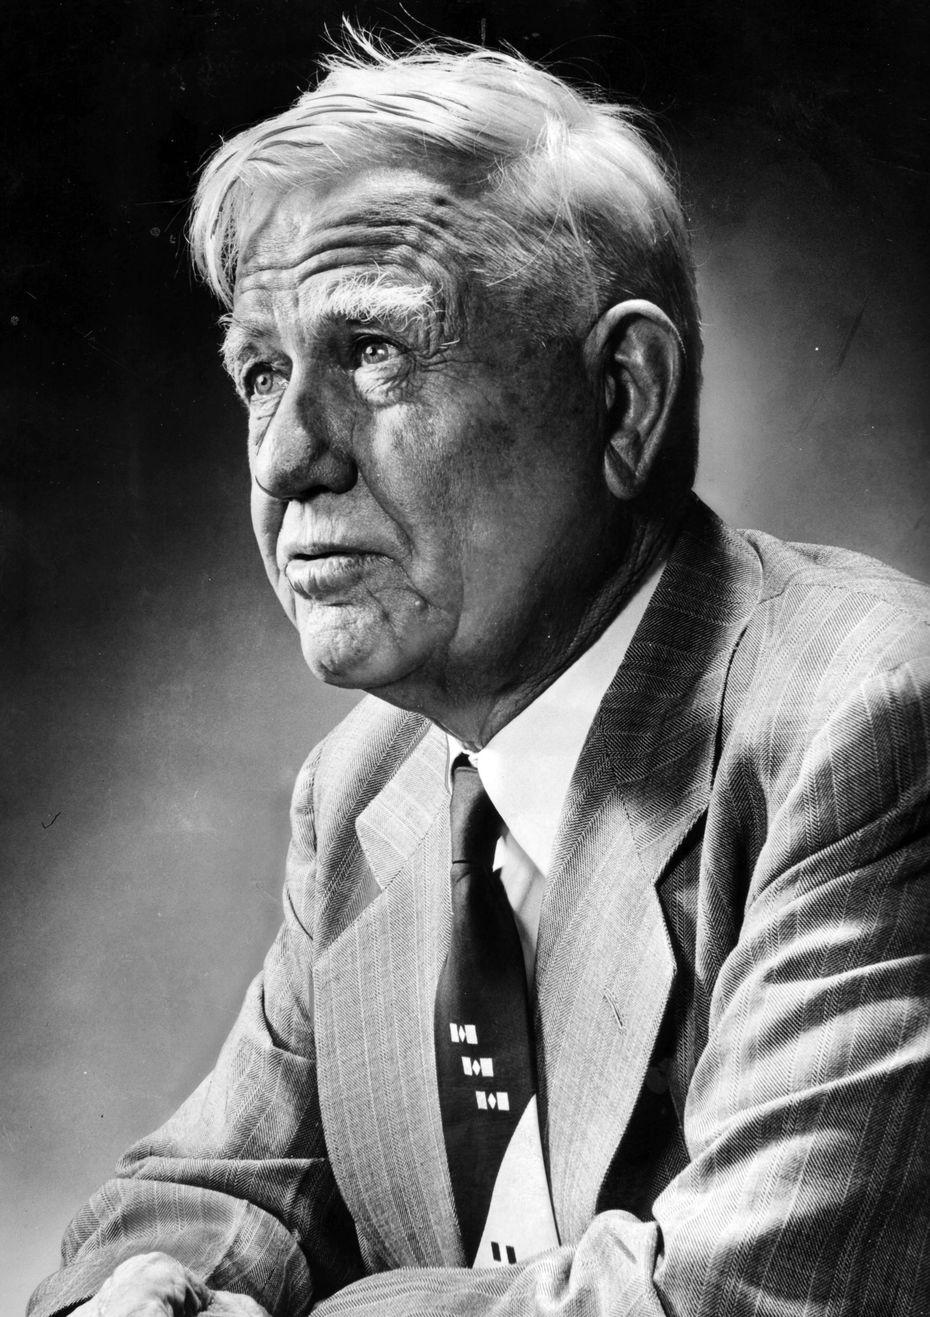 J. Frank Dobie - Texas folklorist, 1888 - 1964